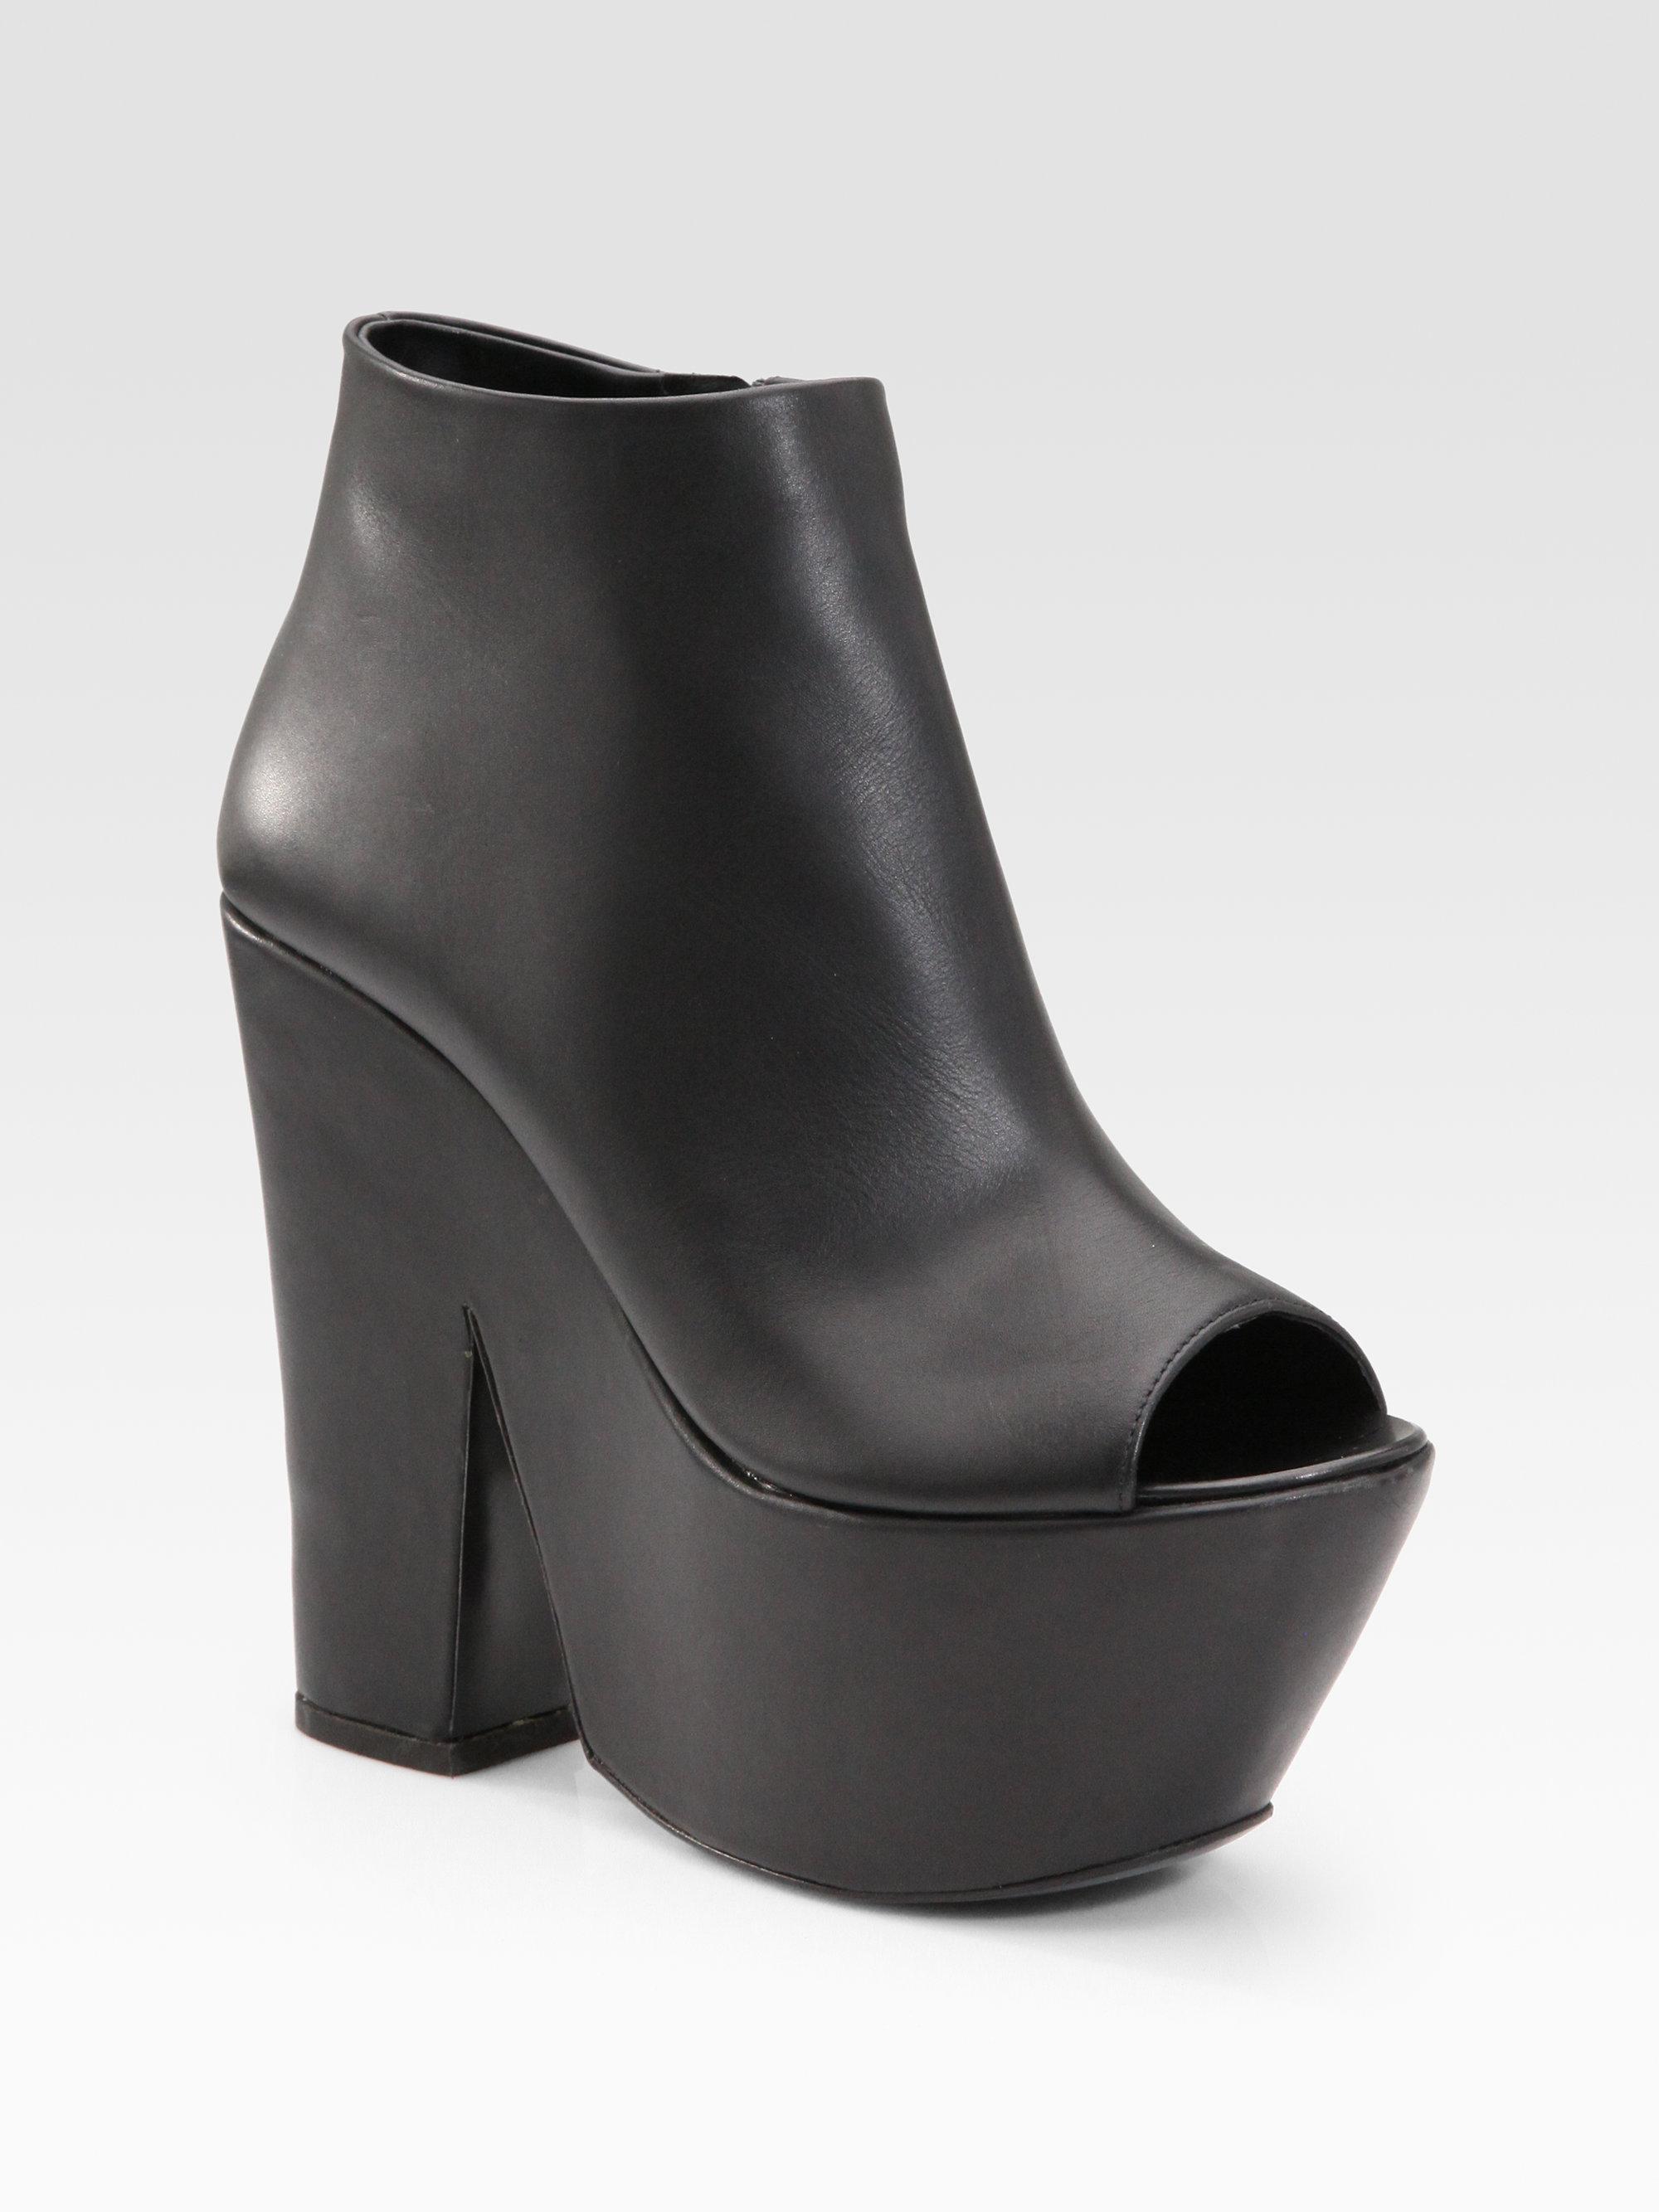 Lyst Giuseppe Zanotti Platform Peep Toe Ankle Boots In Black